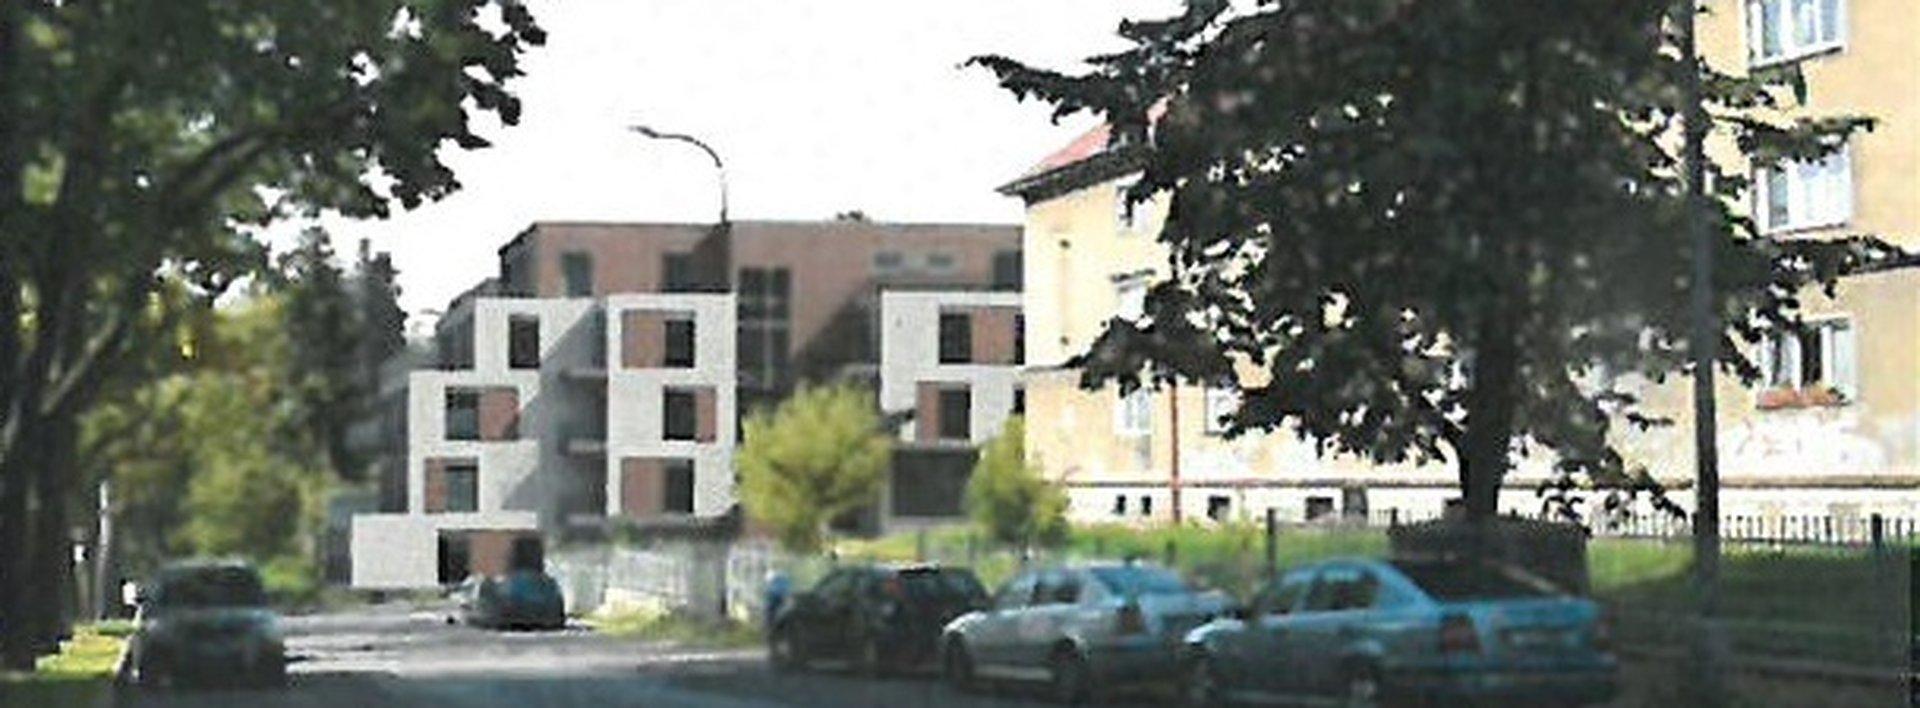 Byt 3+kk v novostavbě - Apartmánový dům Pavlovická, Ev.č.: N47884